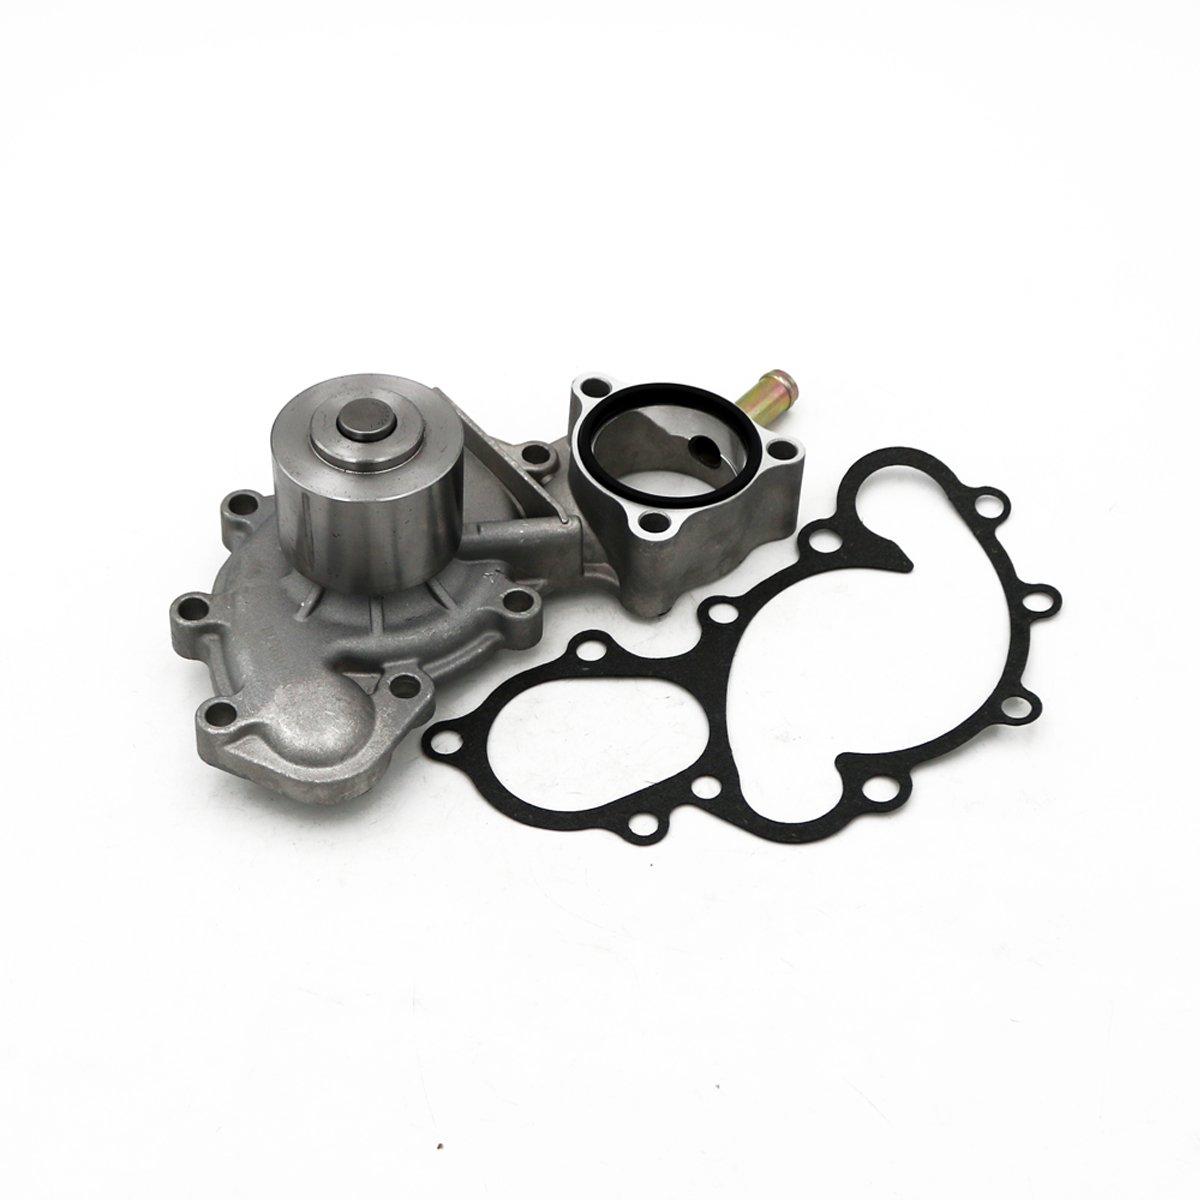 WQ Fits 1995-2004 Toyota Tacoma Tundra 4Runner T100 3.4L V6 DOHC 24 Valve 5VZFE Engine Timing Belt Water Pump Kit